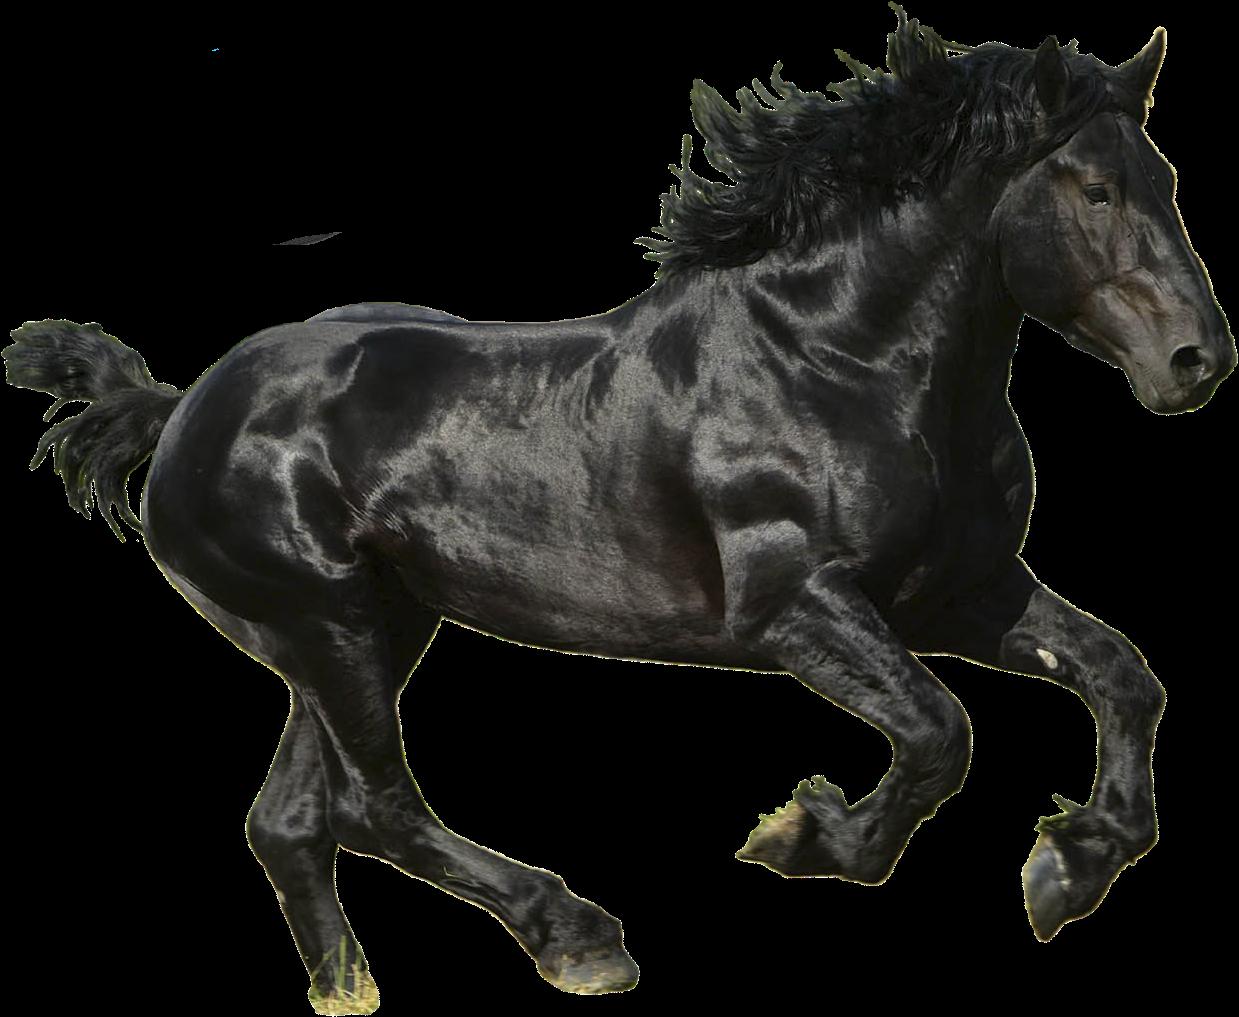 Download Download Png Image Report Black Horse Transparent Background Full Size Png Image Pngkit